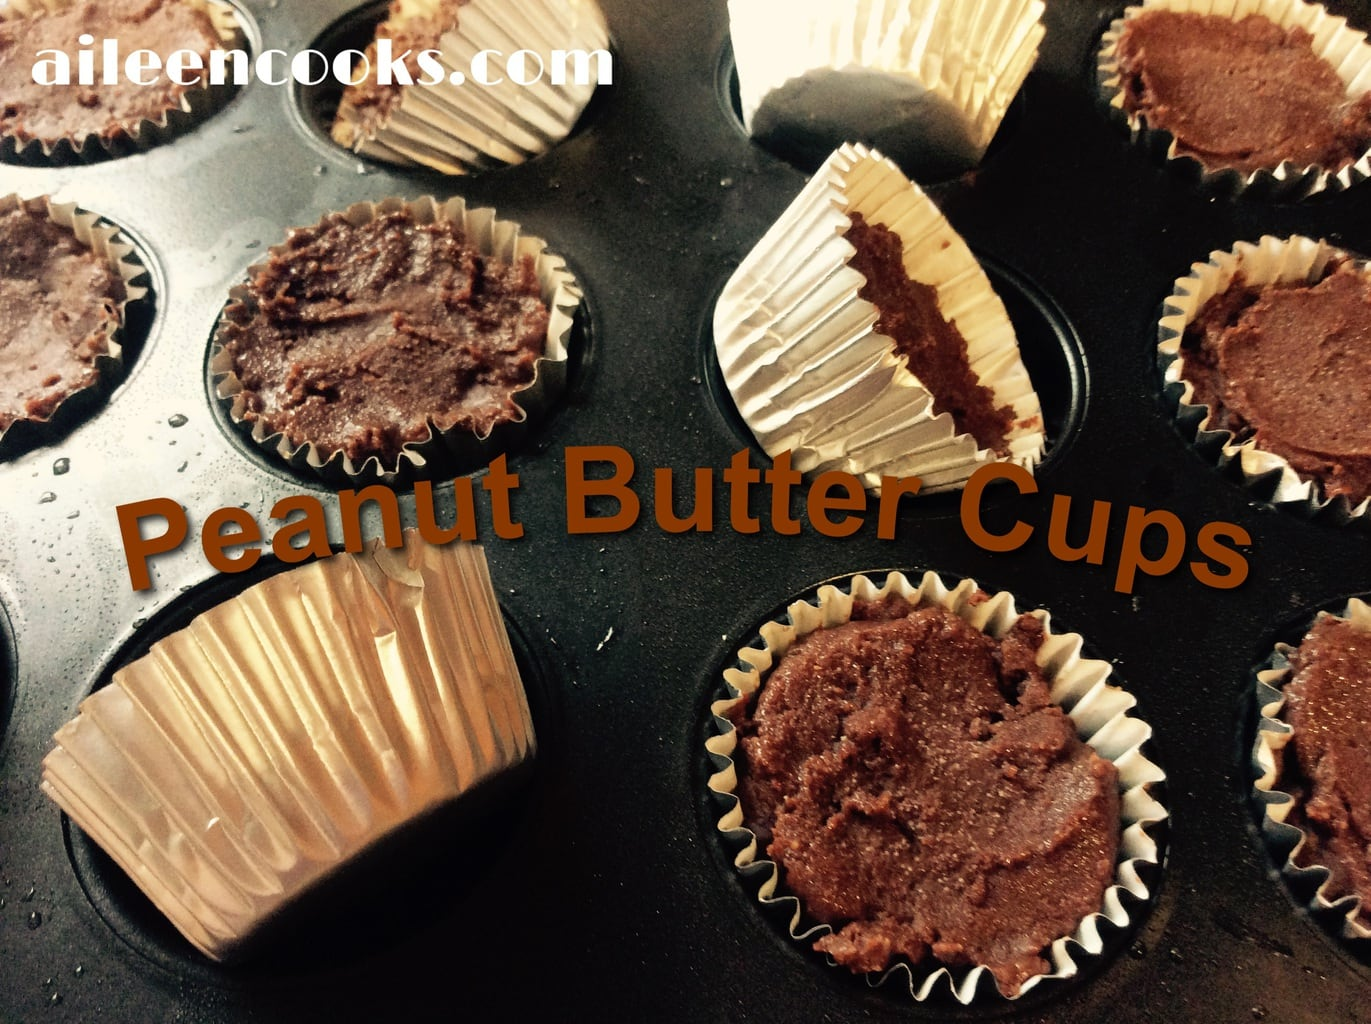 Peanut Butter Cups | Aileen cooks